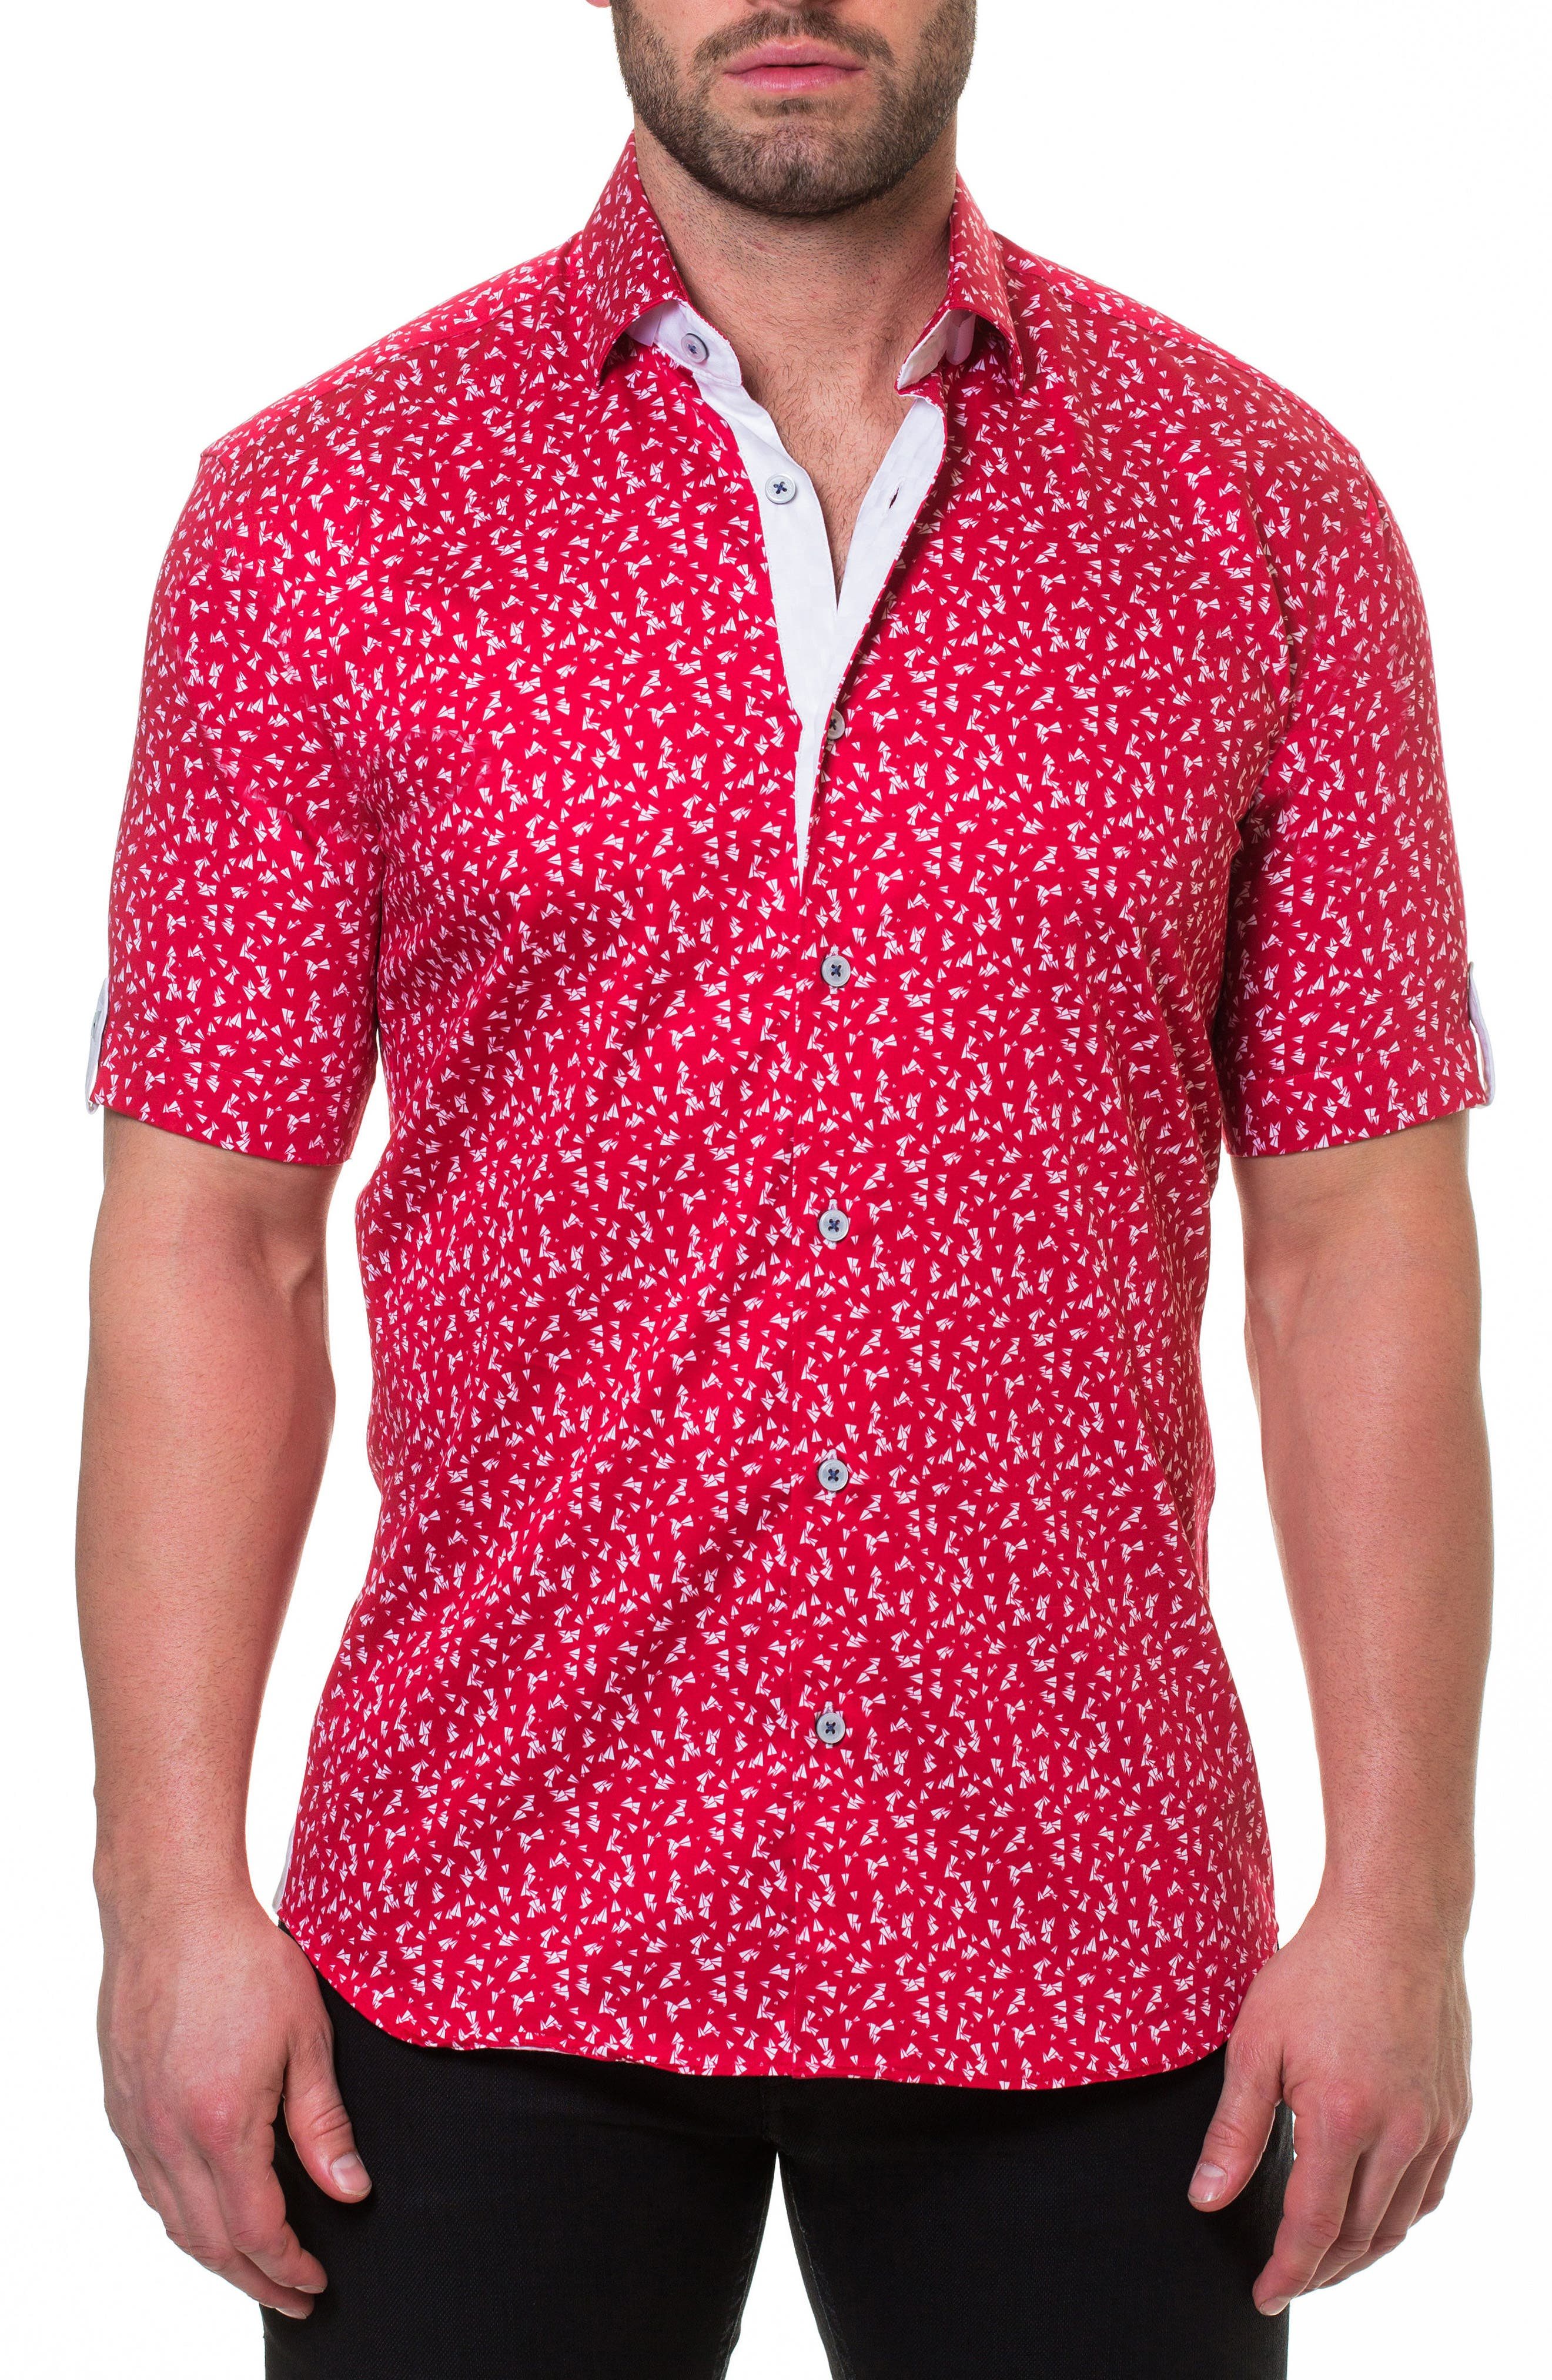 Maceoo Fresh Paper Plane Slim Fit Sport Shirt, Red